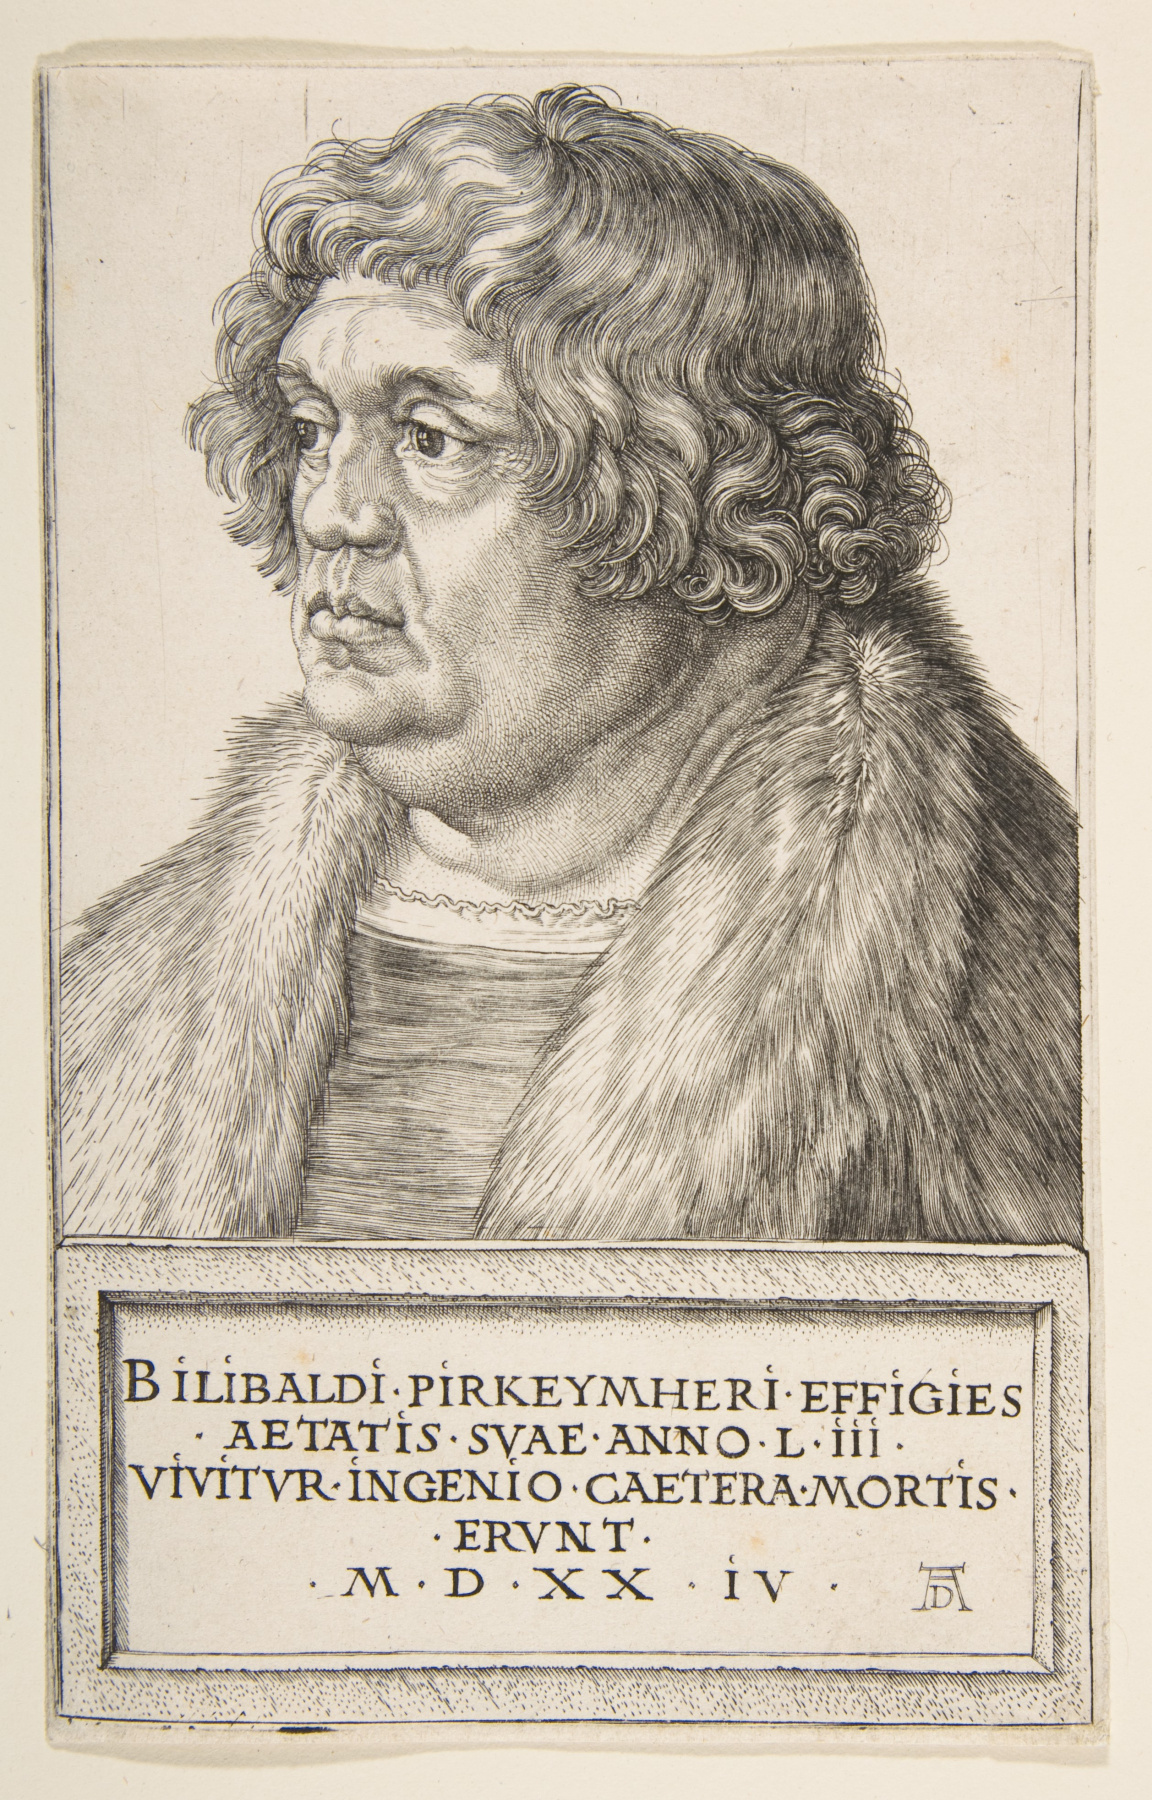 Albrecht Durer. Portrait Of Willibald Of Pirkheimer